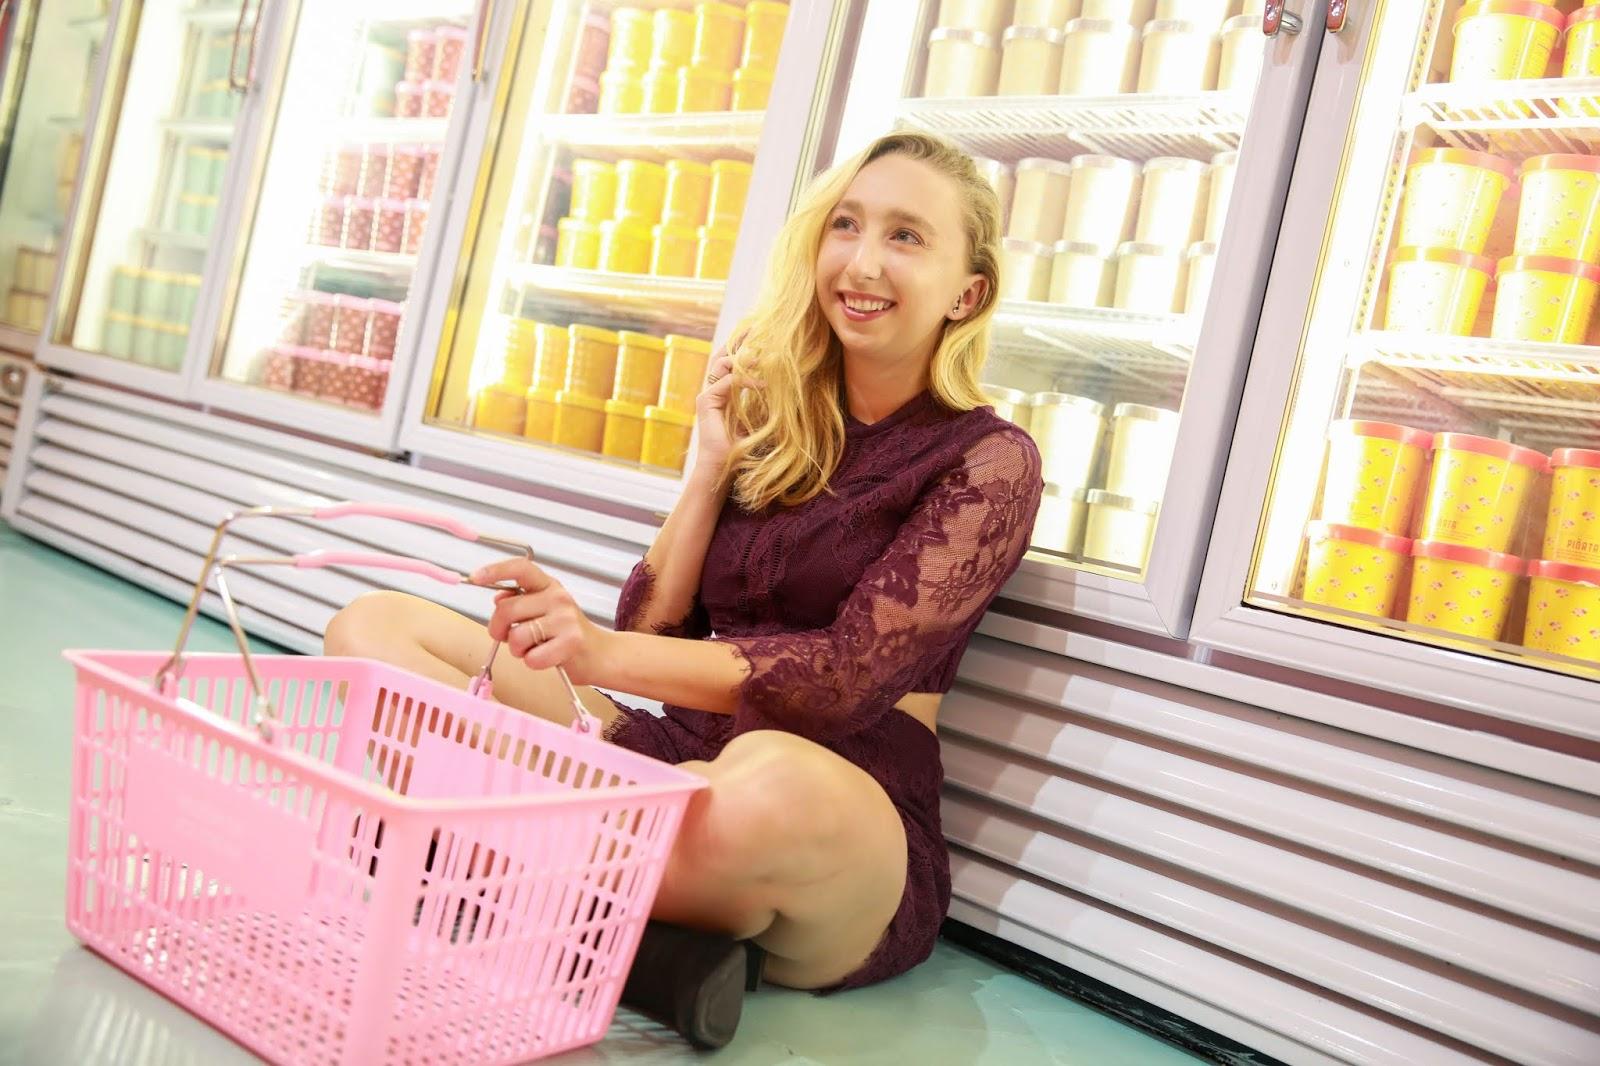 Museum of Ice Cream Pop-Up Shop